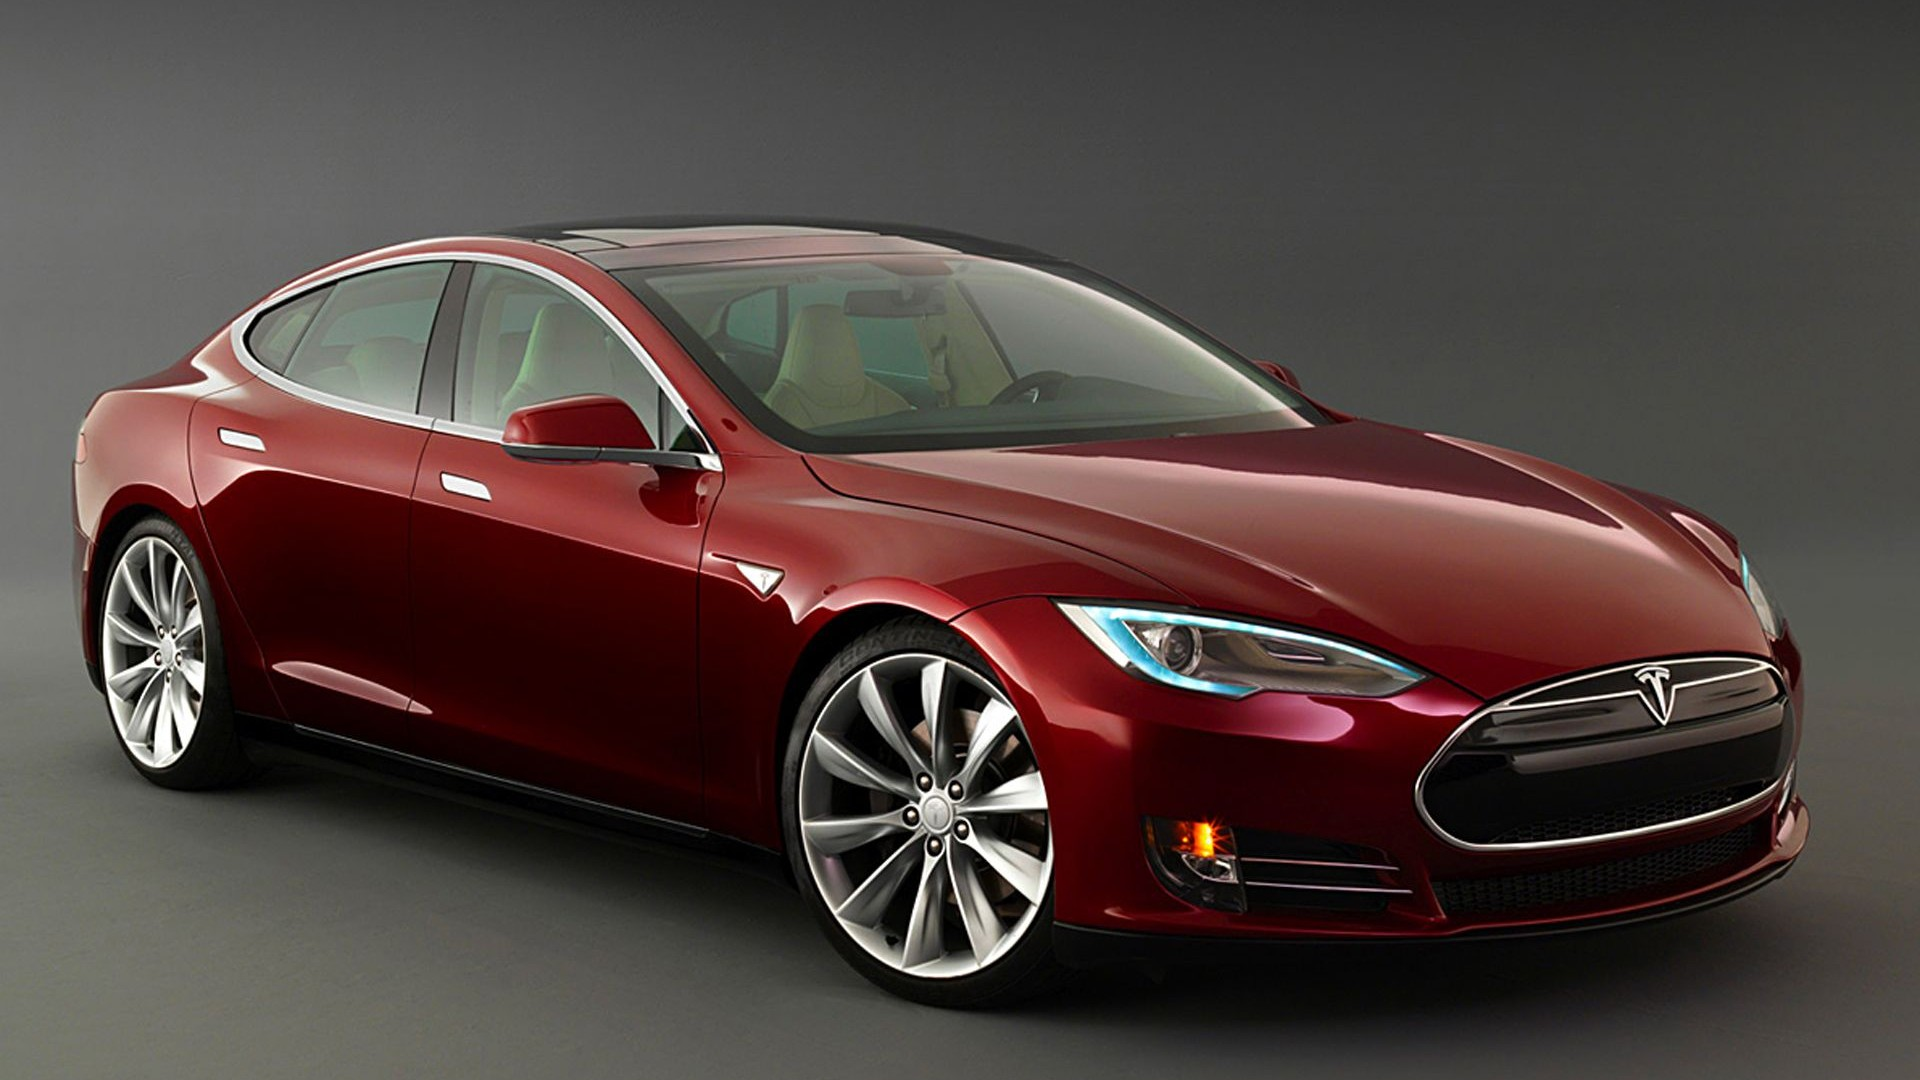 Tesla Electric Car   Car Wallpapers HD 1920x1080